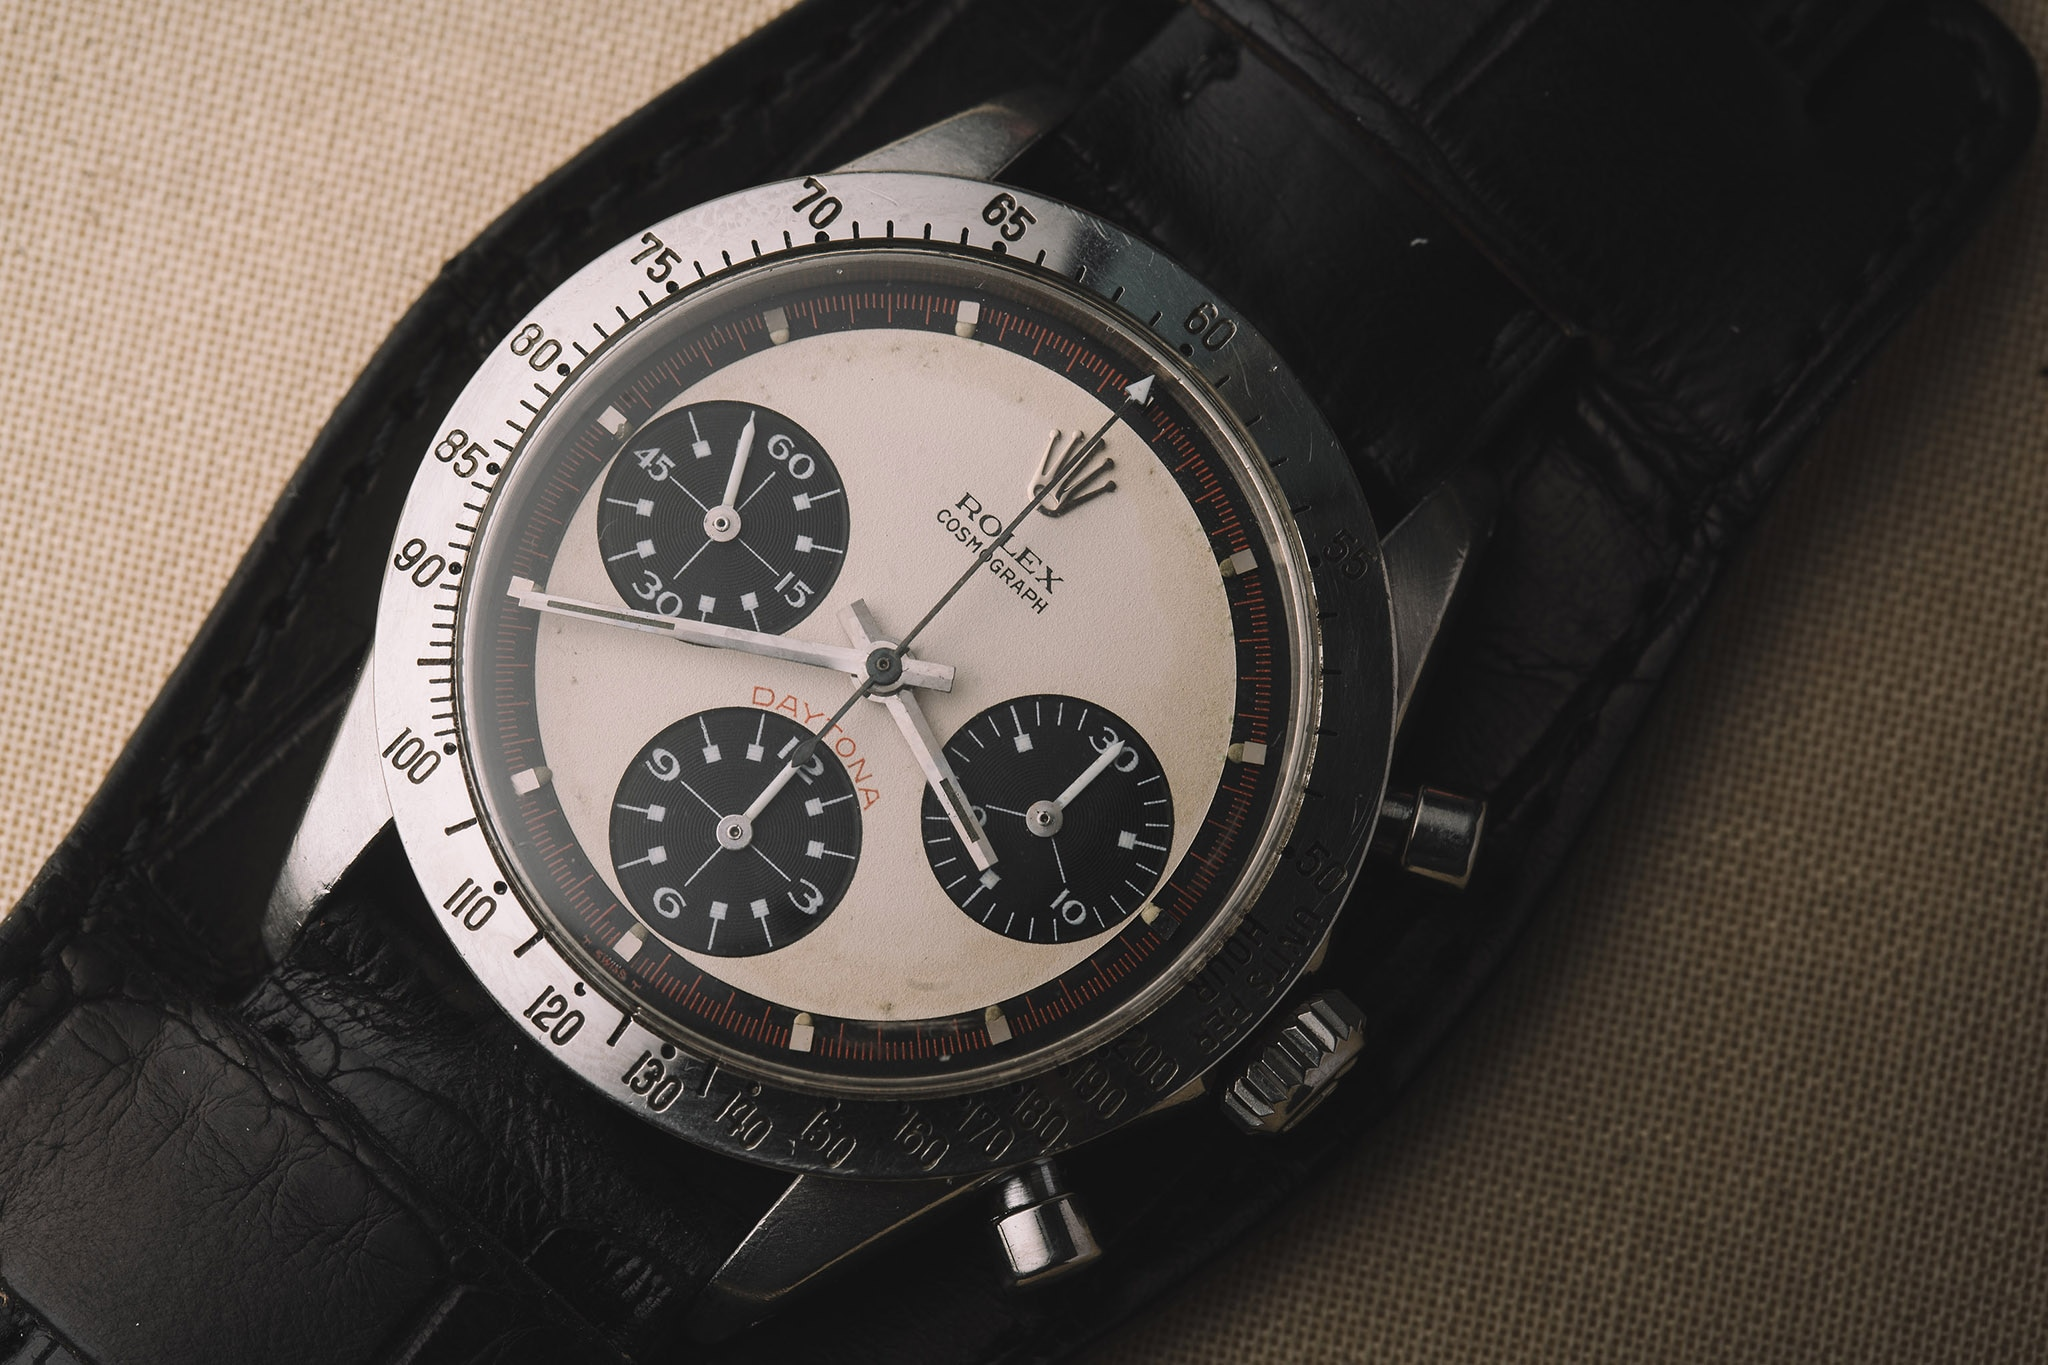 Paul Newman Rolex Daytona Front